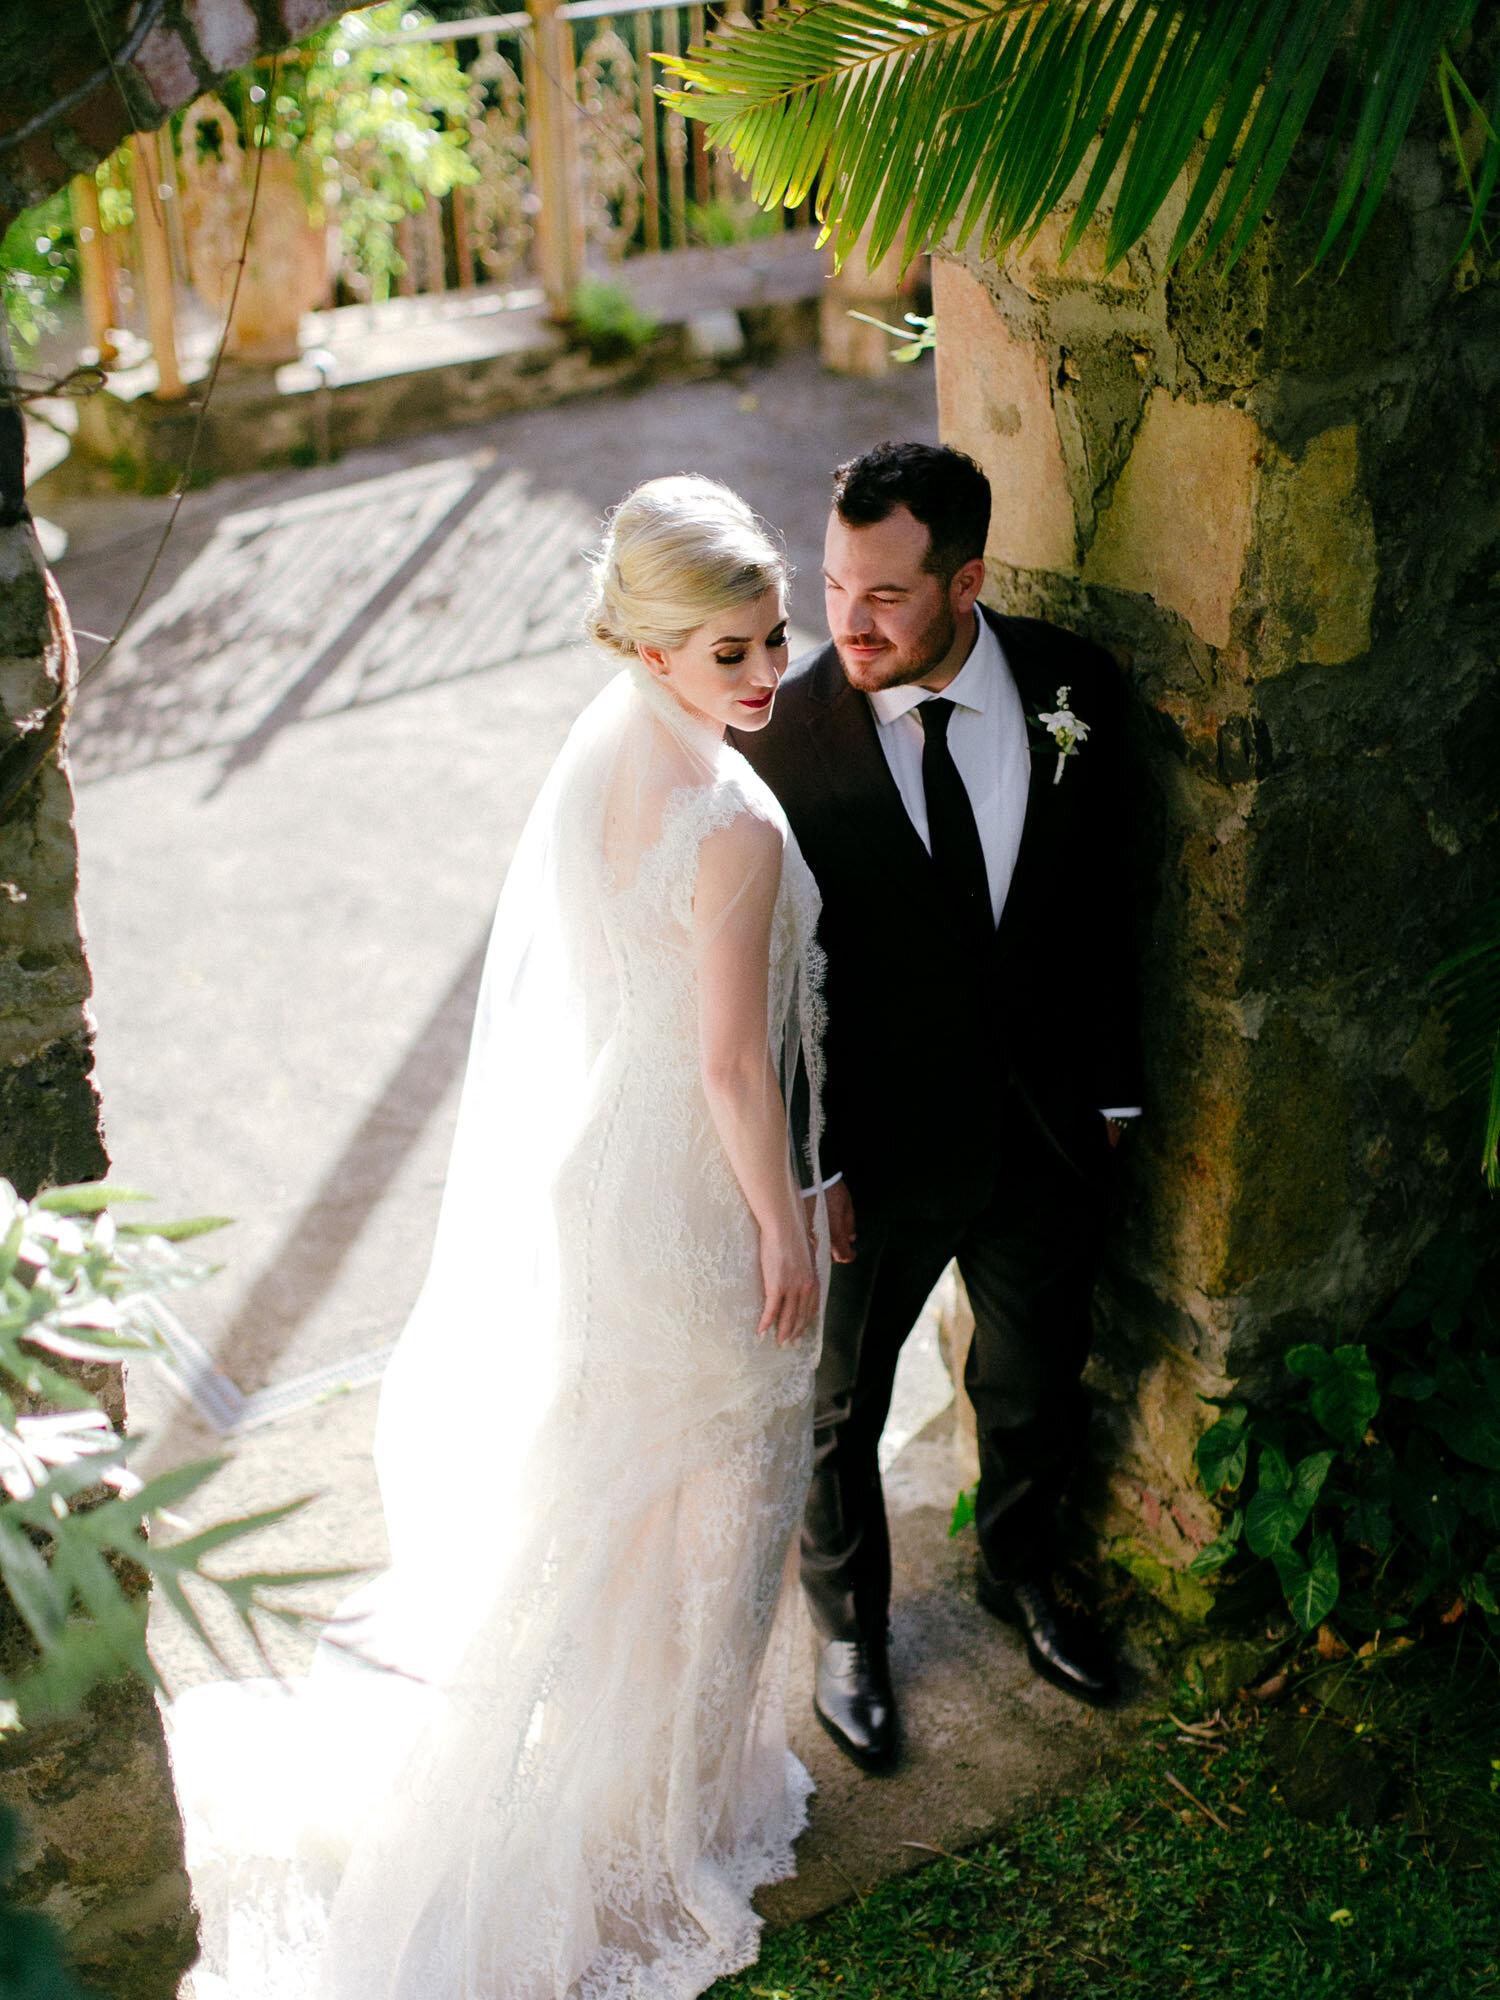 Chris-J-Evans-Maui-Wedding-Kim&Brian3300.jpg